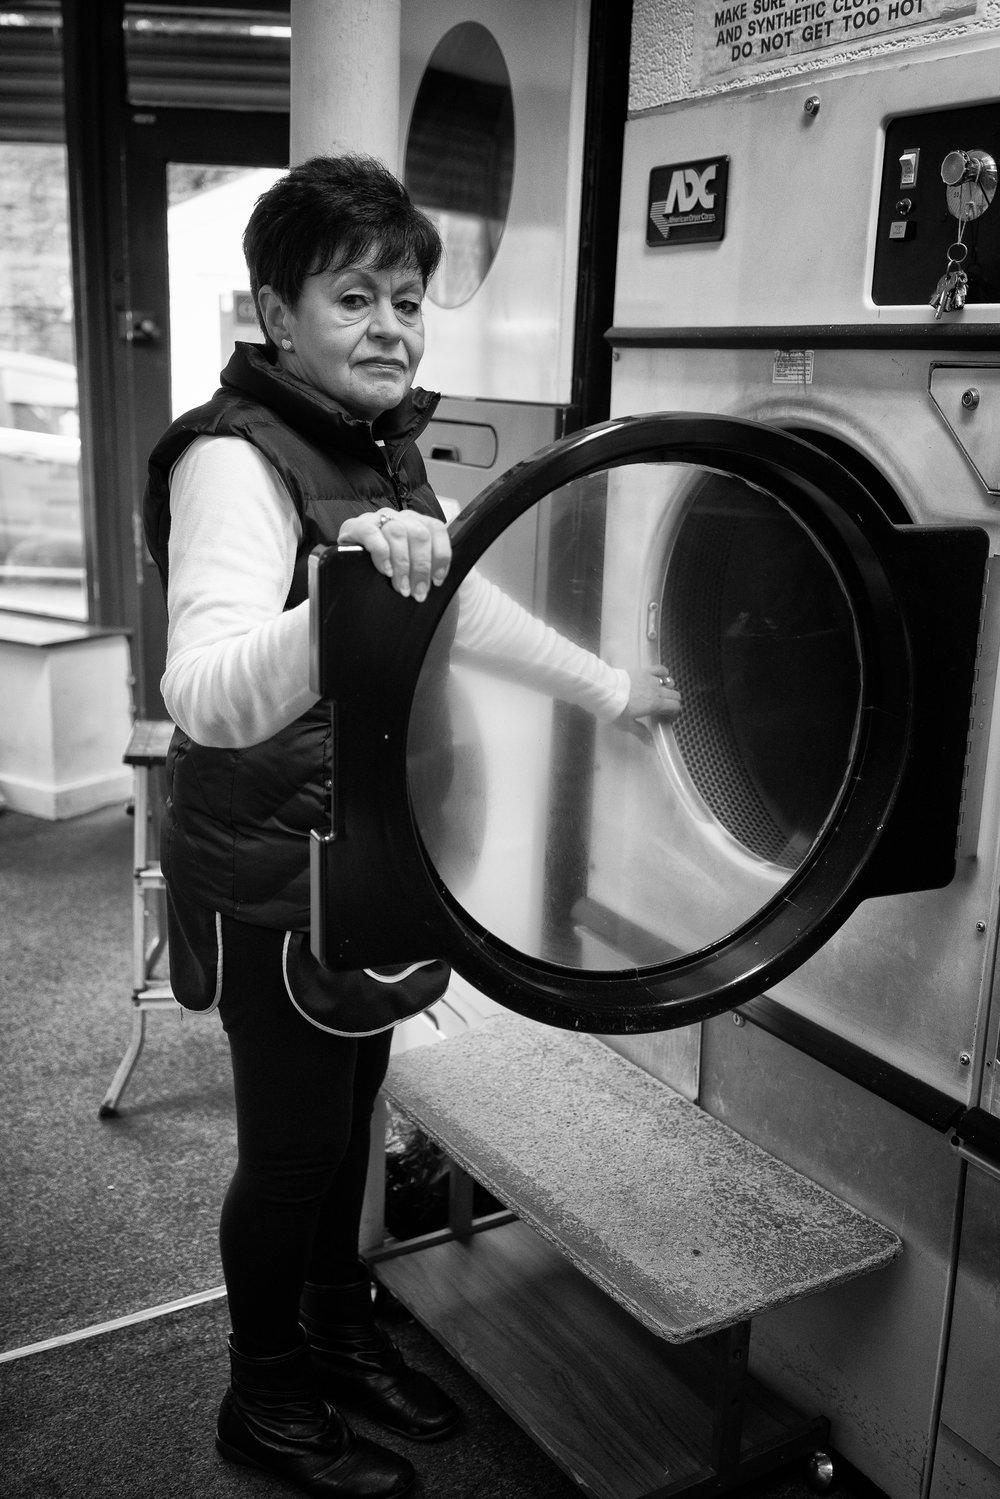 Dowlais laundry.